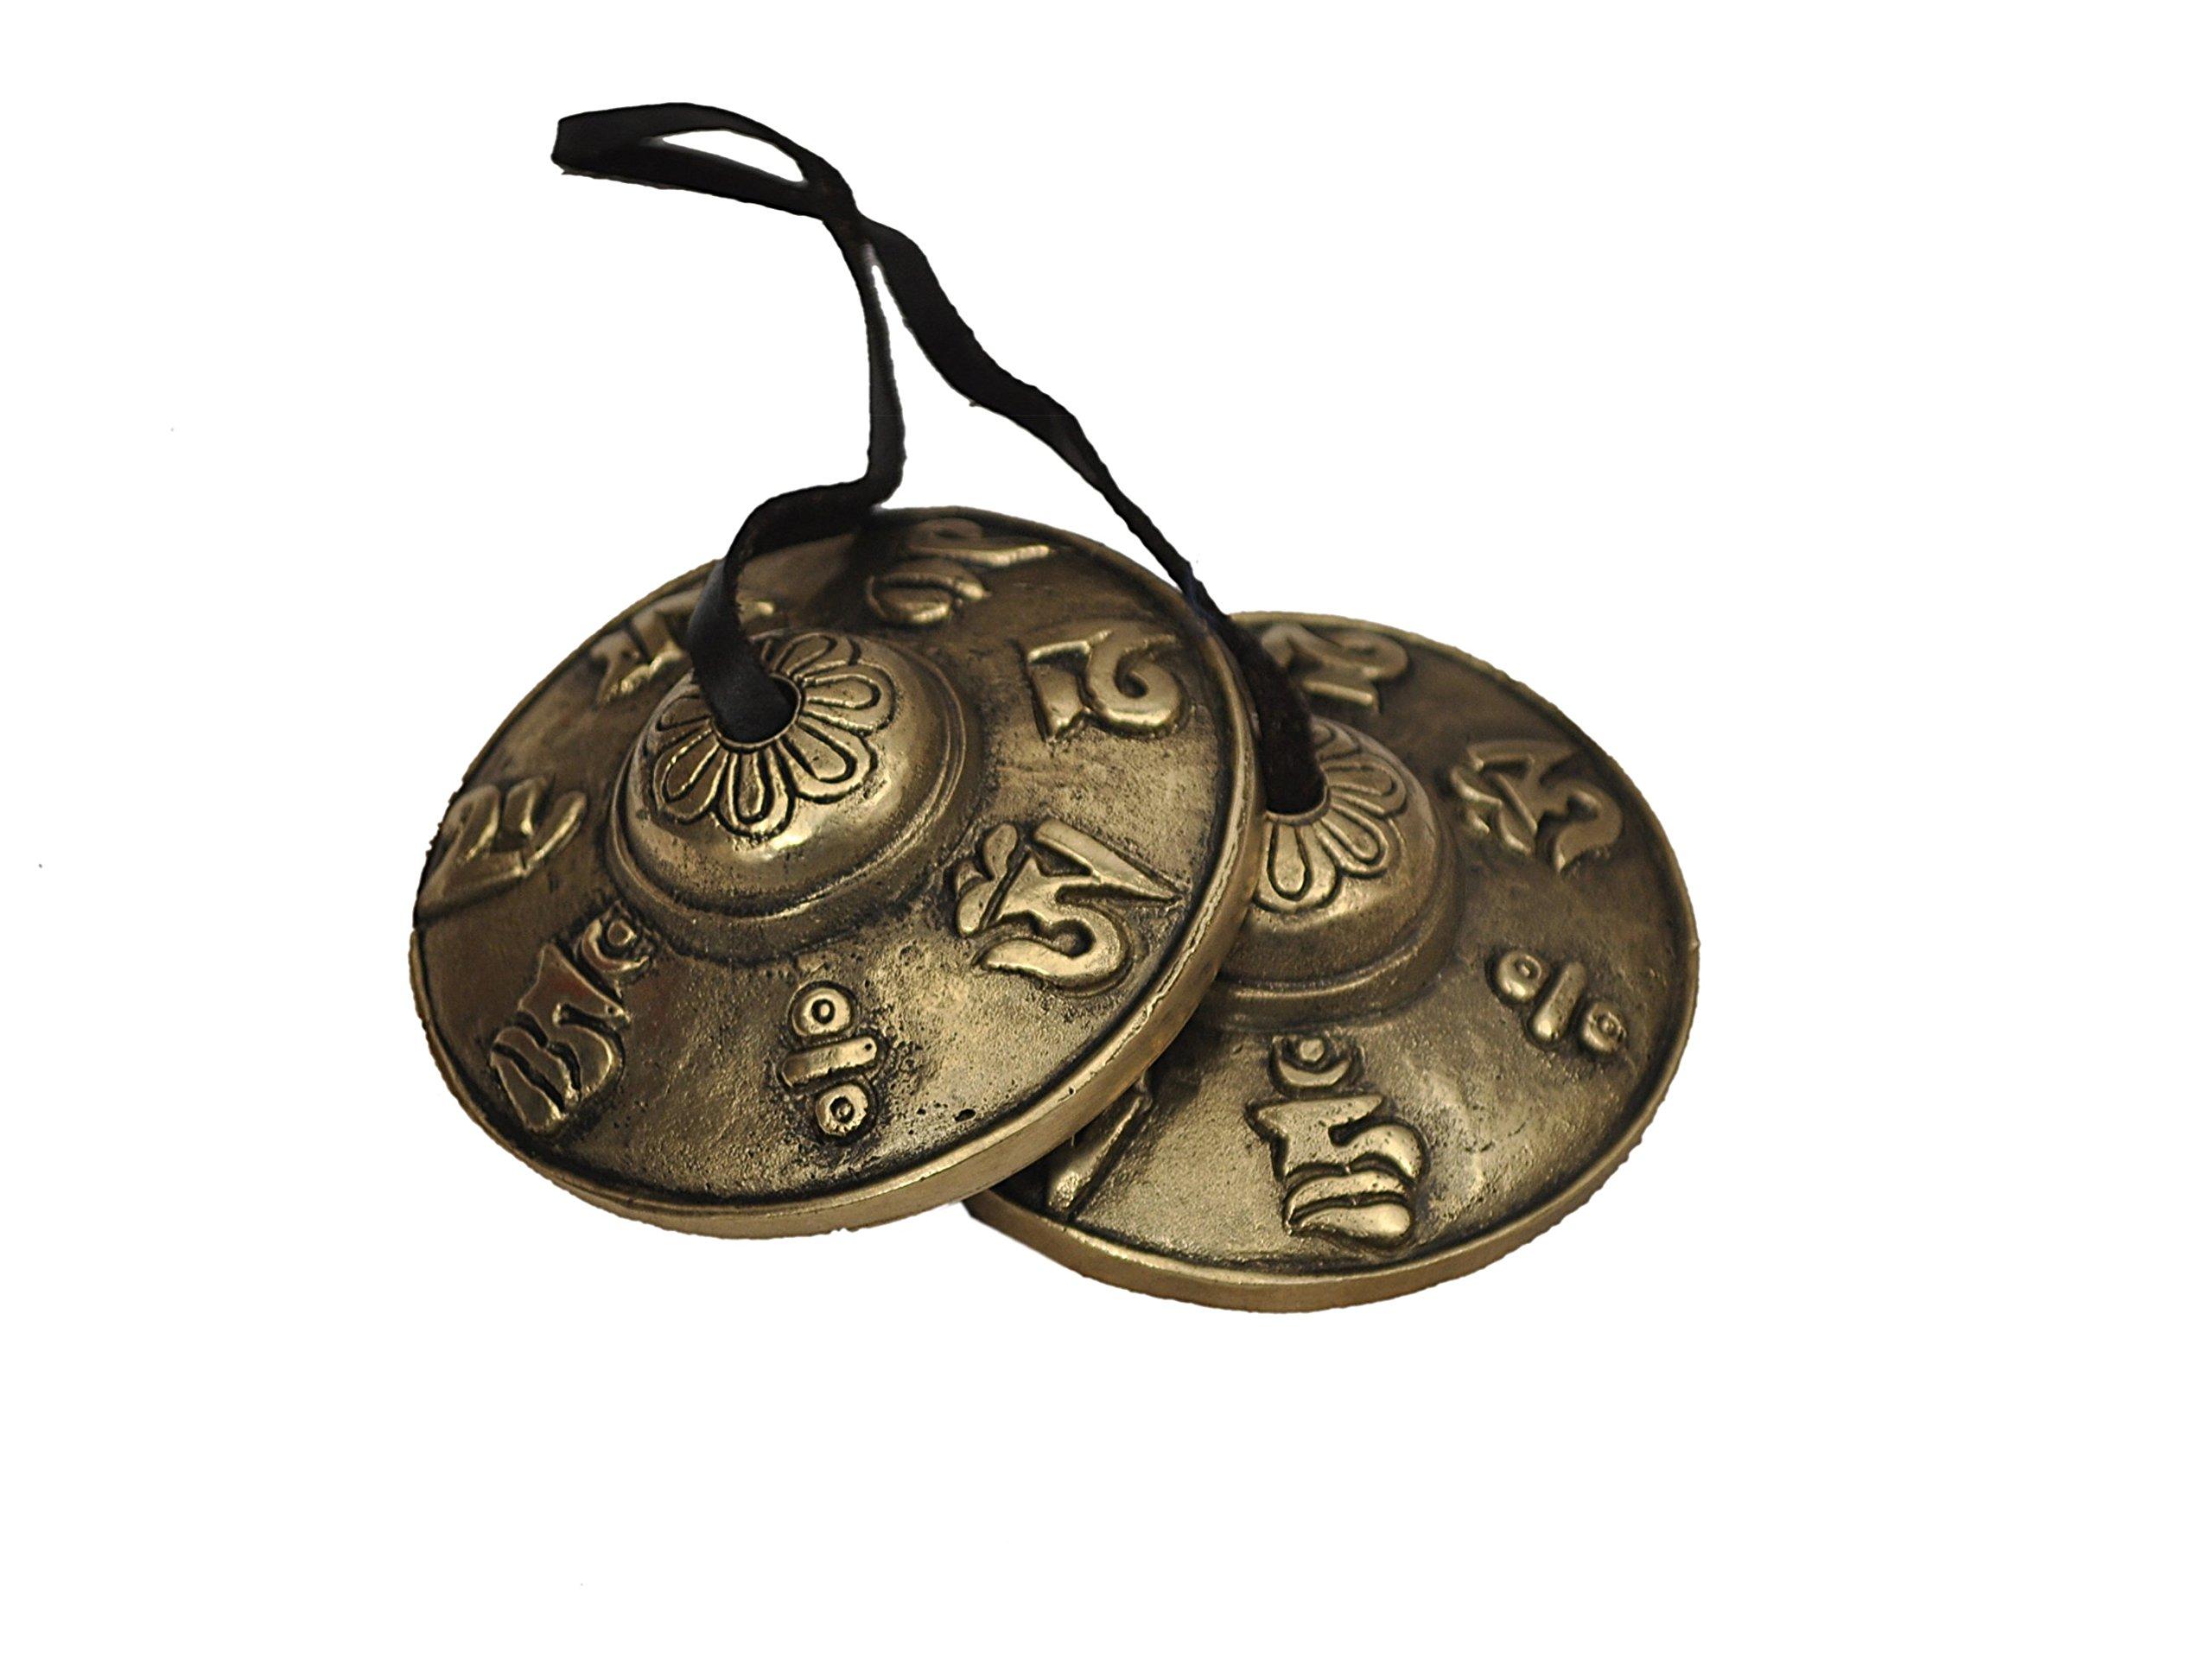 Dharma Store - Tibetan Tingsha Cymbals - 6.6 cm - OM Mane Padme Hum Symbols Embossed by Dharma Store